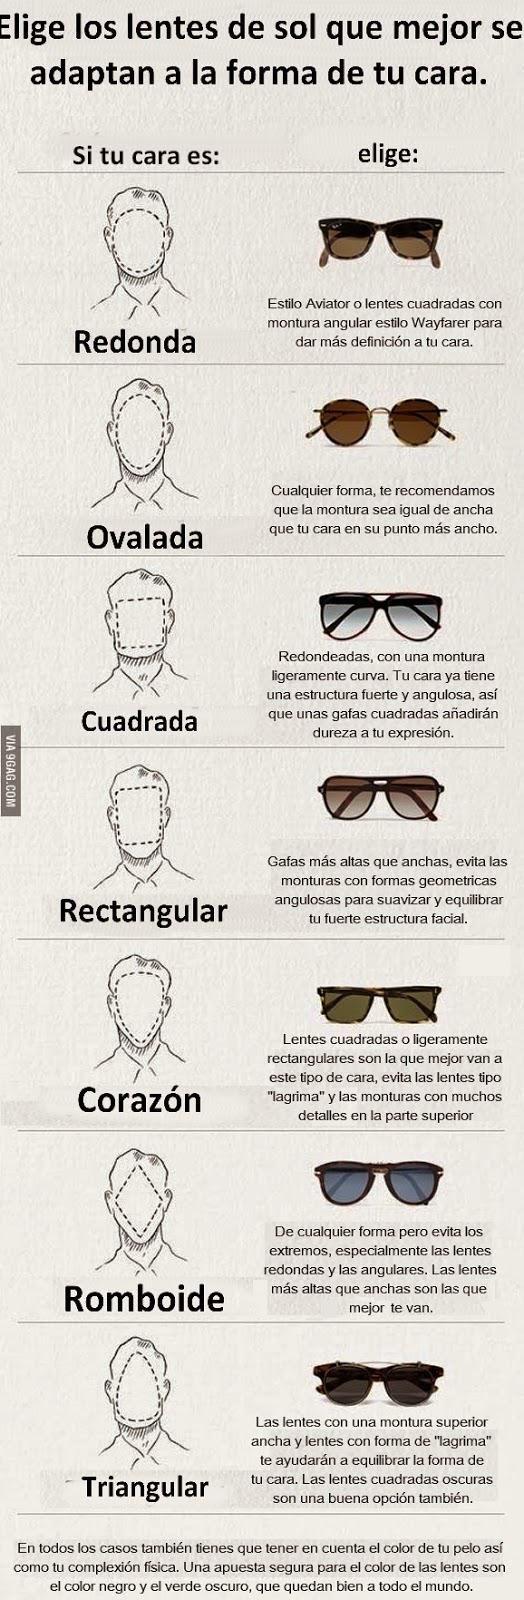 Grupoconfort On Twitter Monturas De Gafas Para Hombre Gafas Para Hombre Anteojos Para Hombre